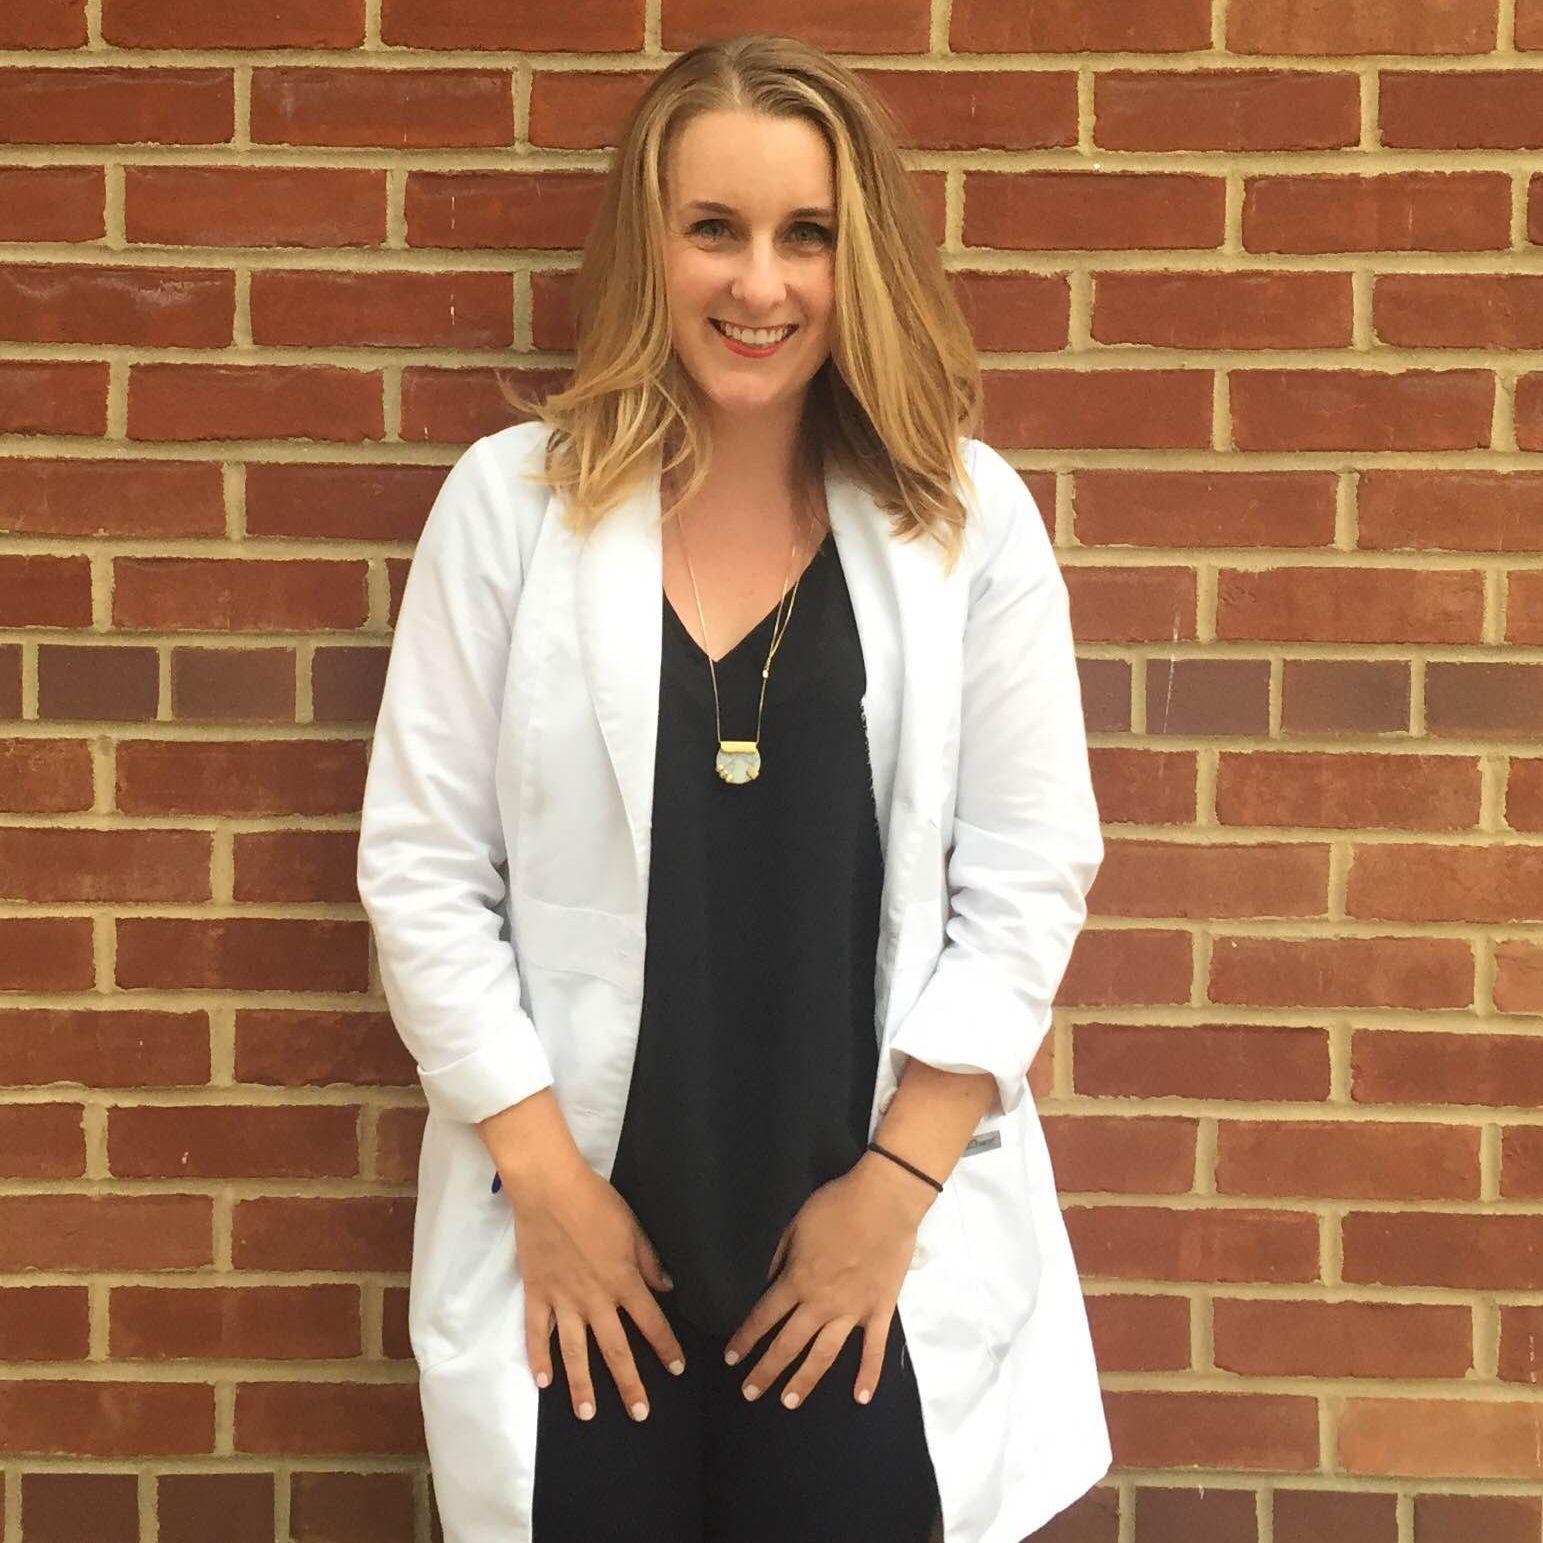 Alexis Pitcairn, an August graduate of the women's health nurse practitioner program and W. Va. trip student liaison